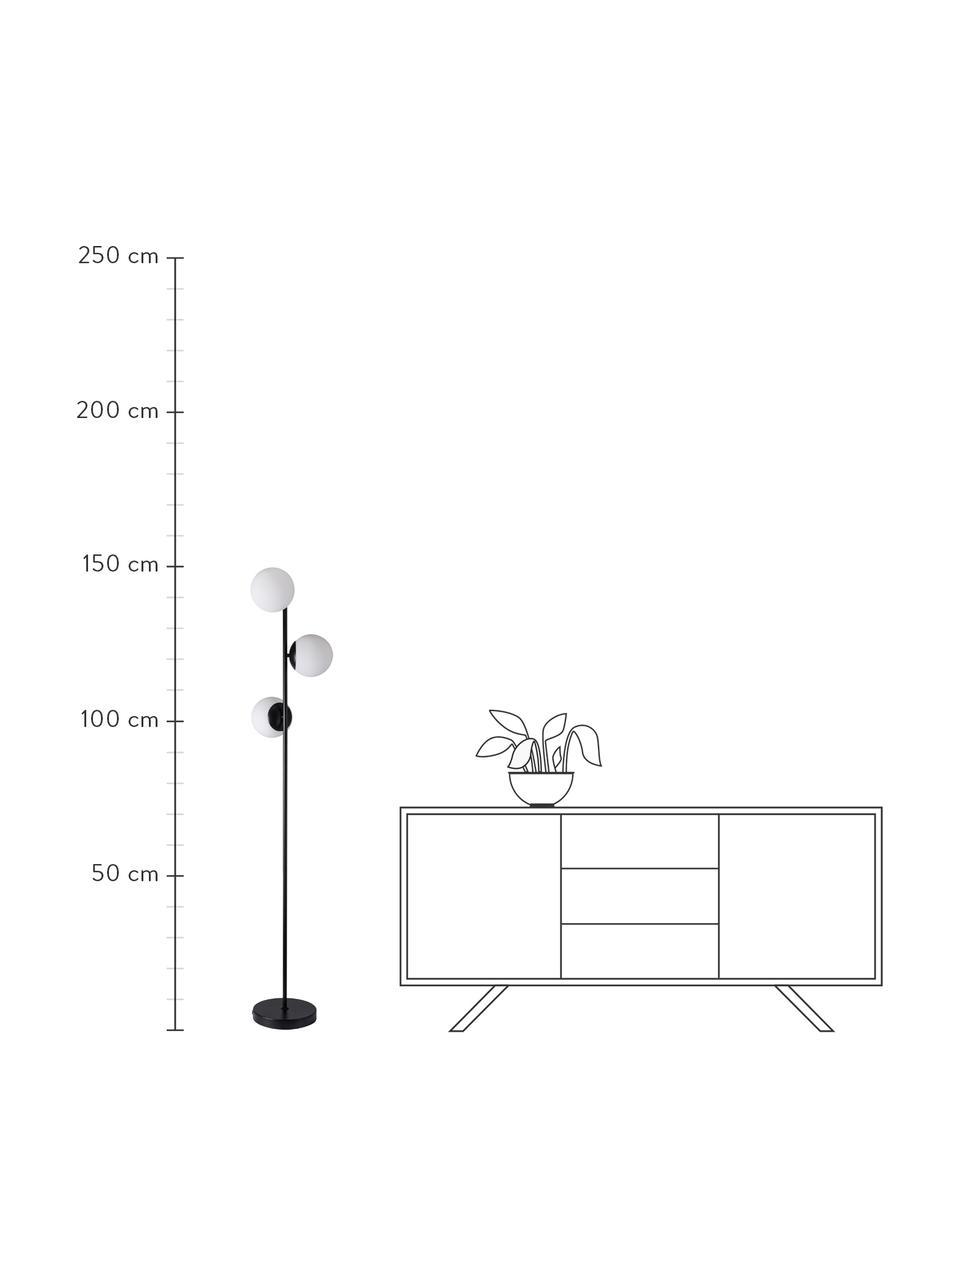 Vloerlamp Lilly van opaalglas, Lampvoet: gecoat metaal, Zwart, wit, Ø 30 x H 150 cm